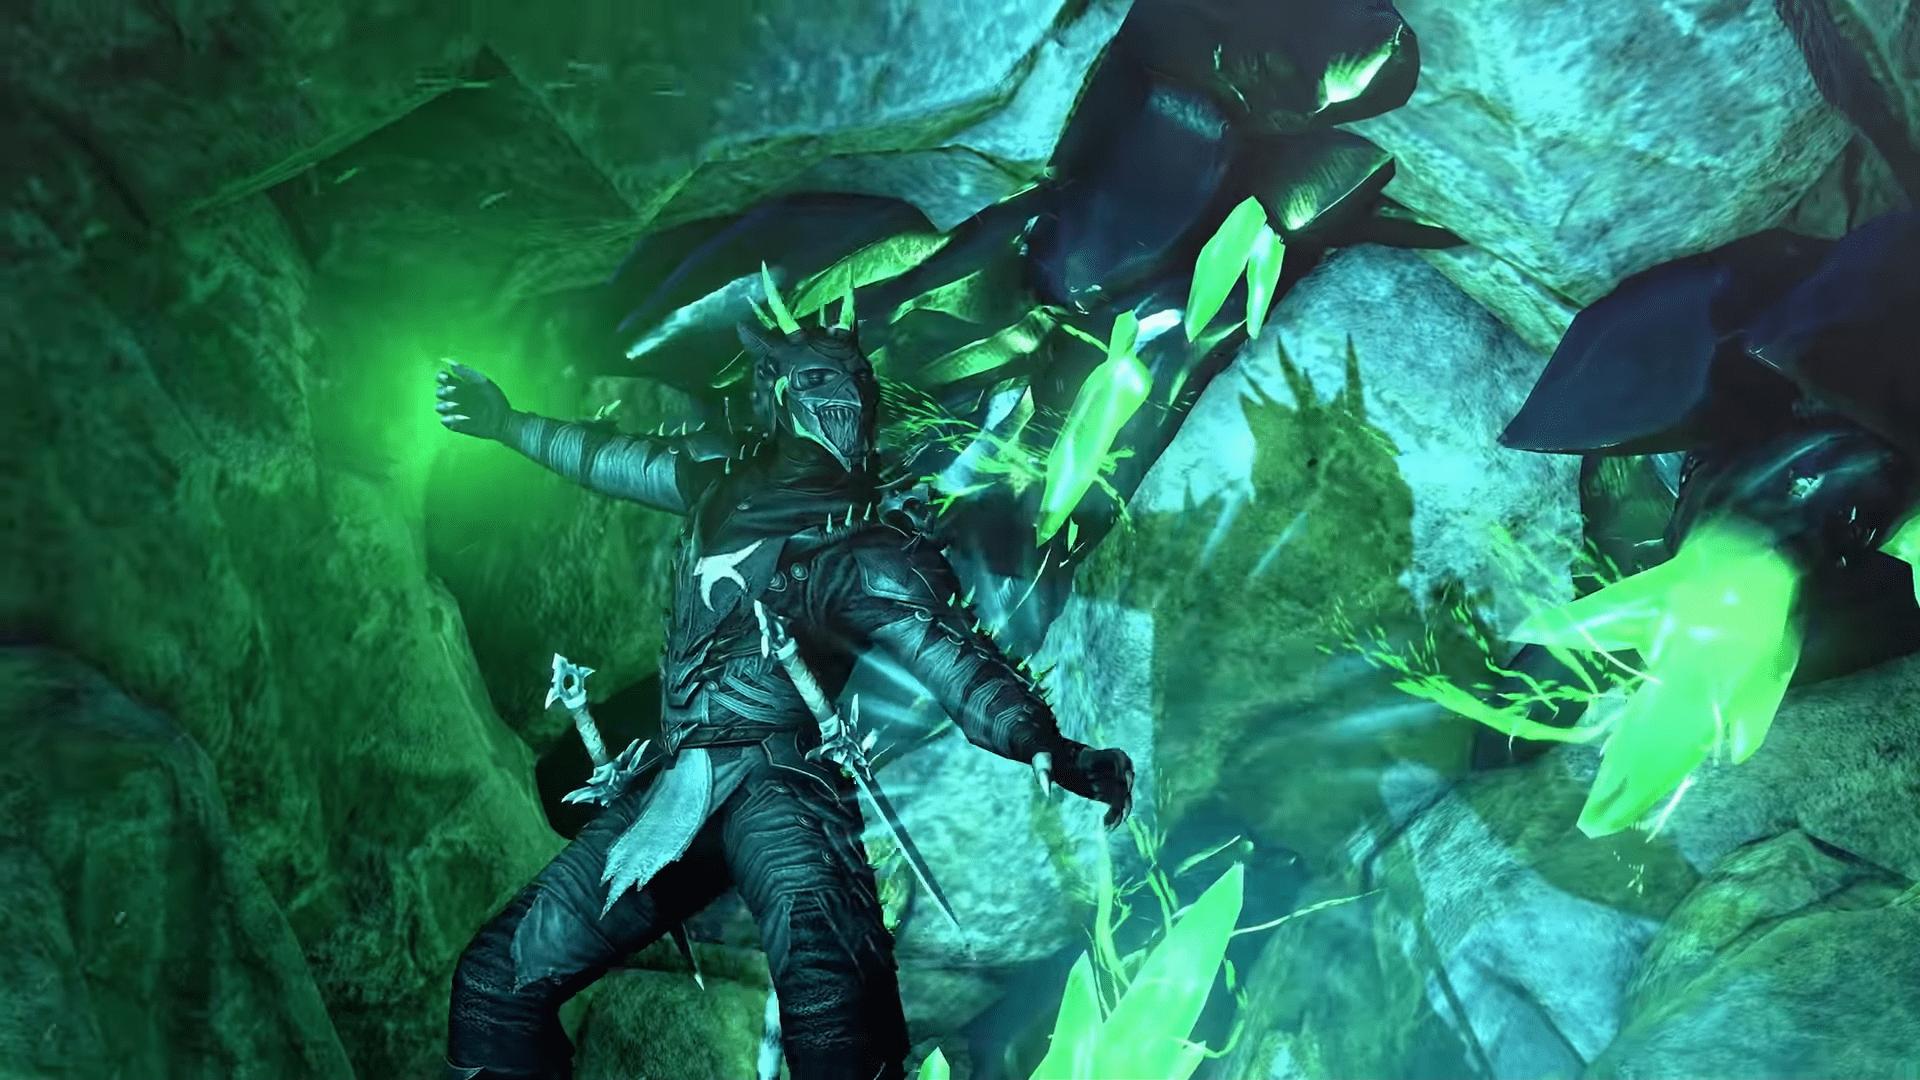 Elder Scrolls Online Announces Return Of Undaunted Celebration With Unique Rewards